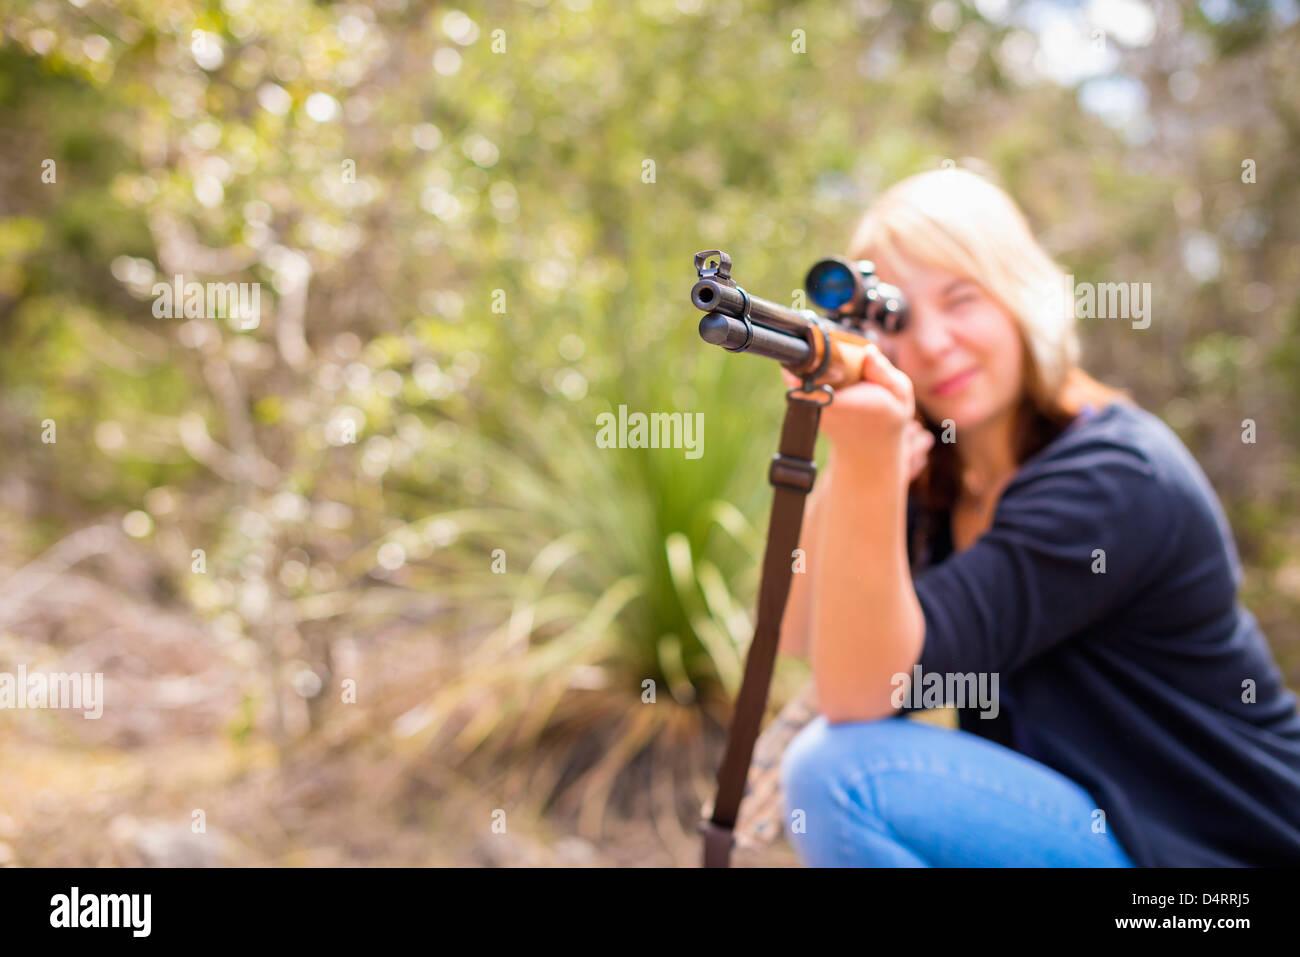 Young woman shooting a hunting rifle firearm, Female 19 Caucasian, Texas, USA - Stock Image